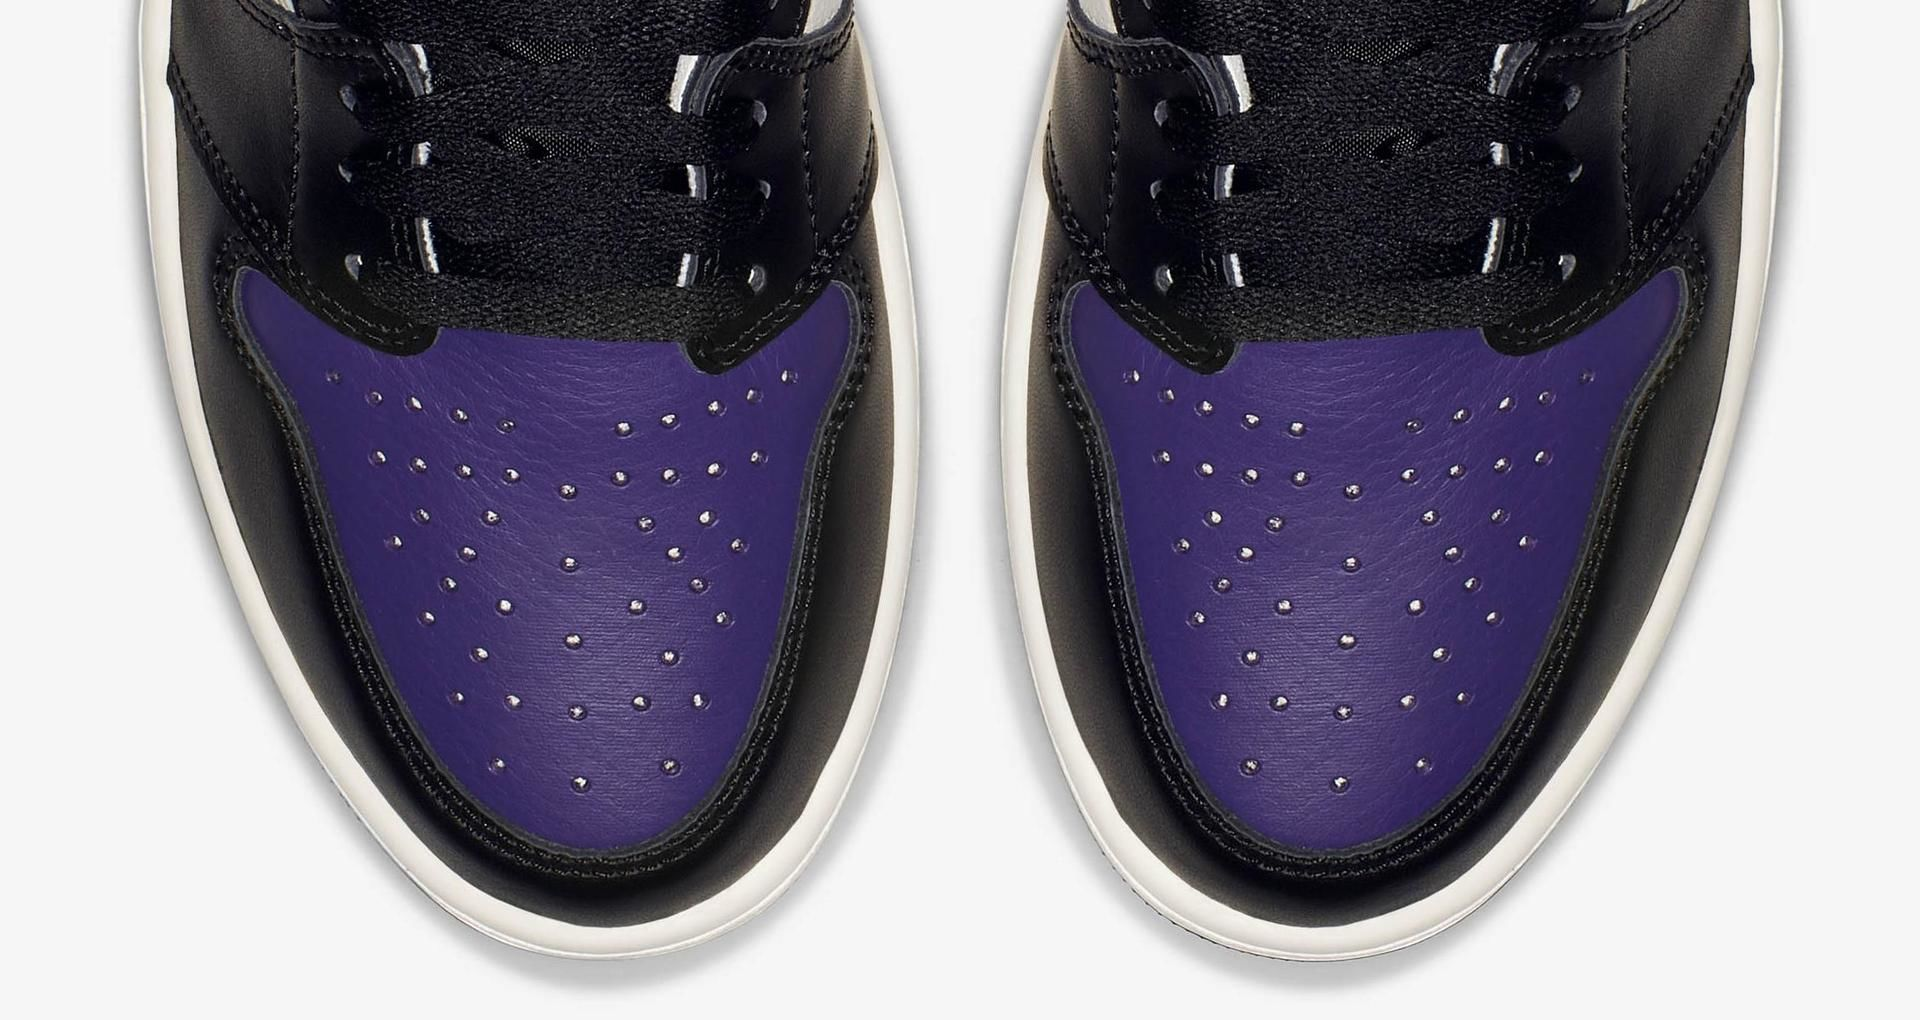 9edb31bb200 Air Jordan 1 Retro 'Court Purple' Release Date. Nike+ SNKRS